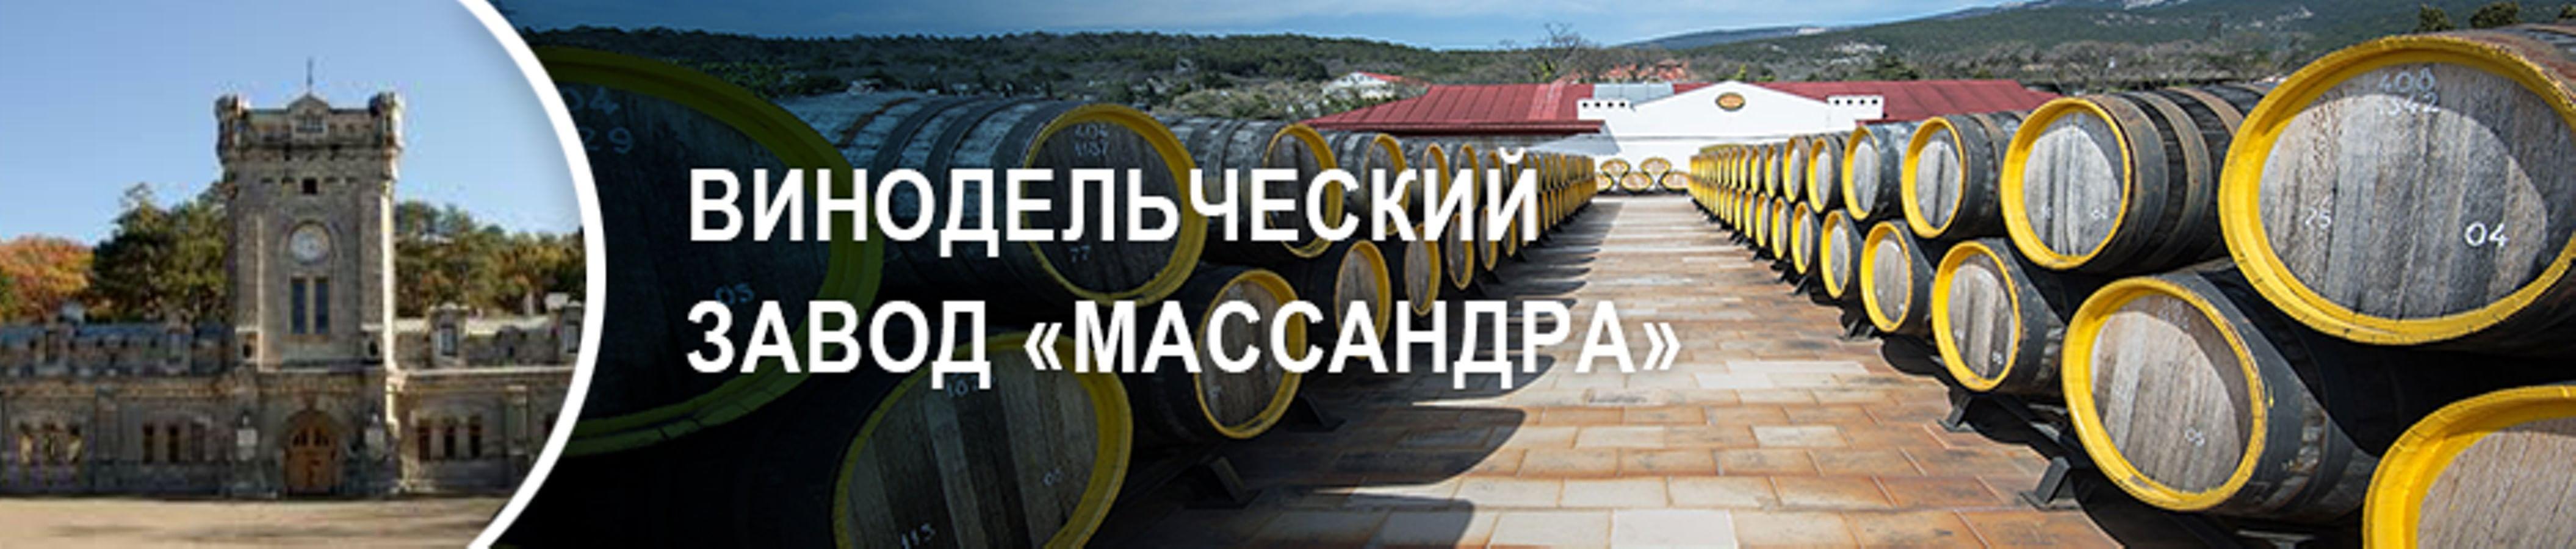 Завод «Массандра»